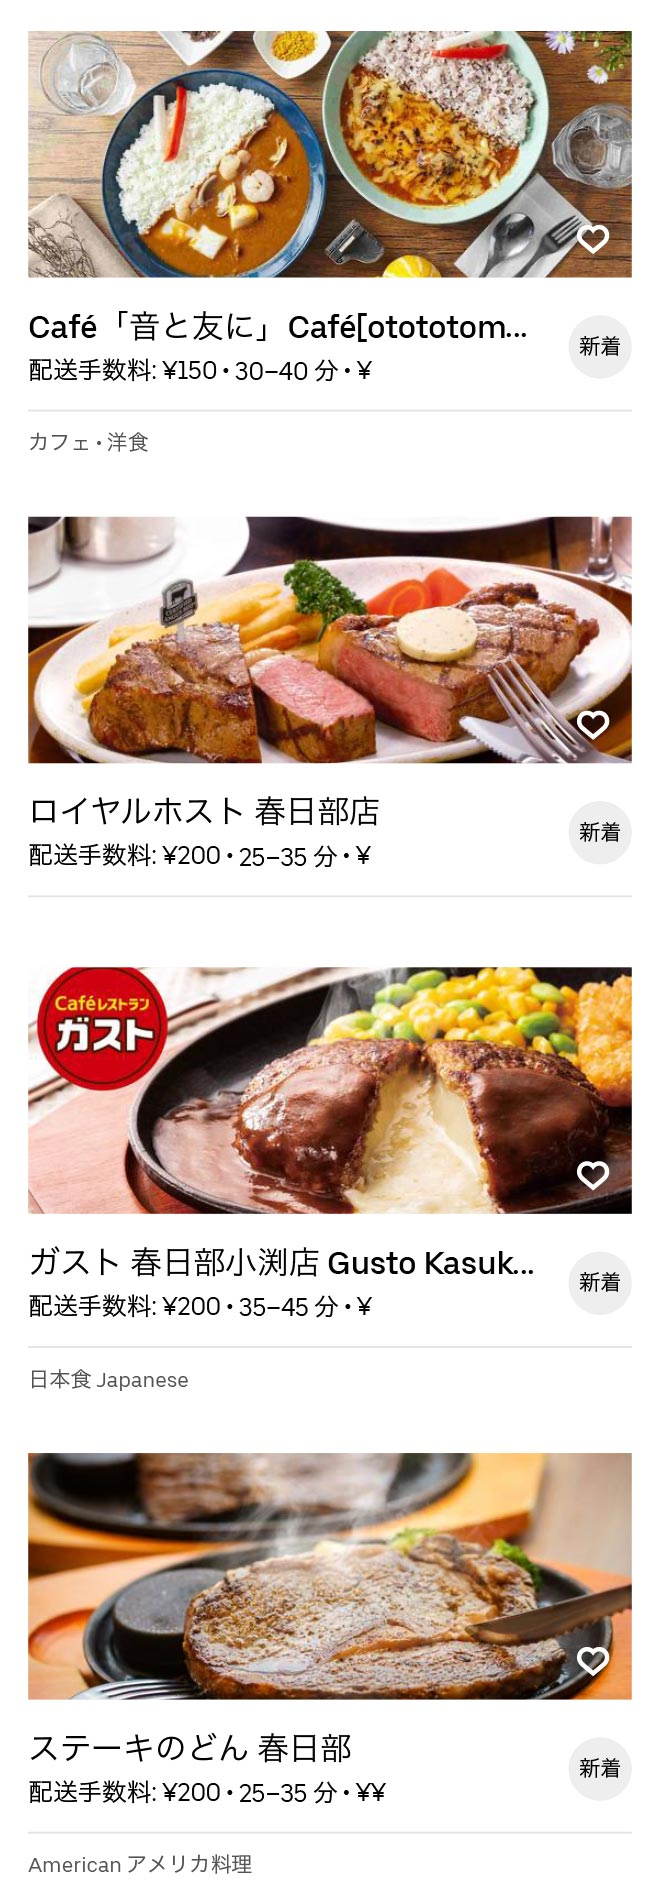 Kasukabe menu 2009 03